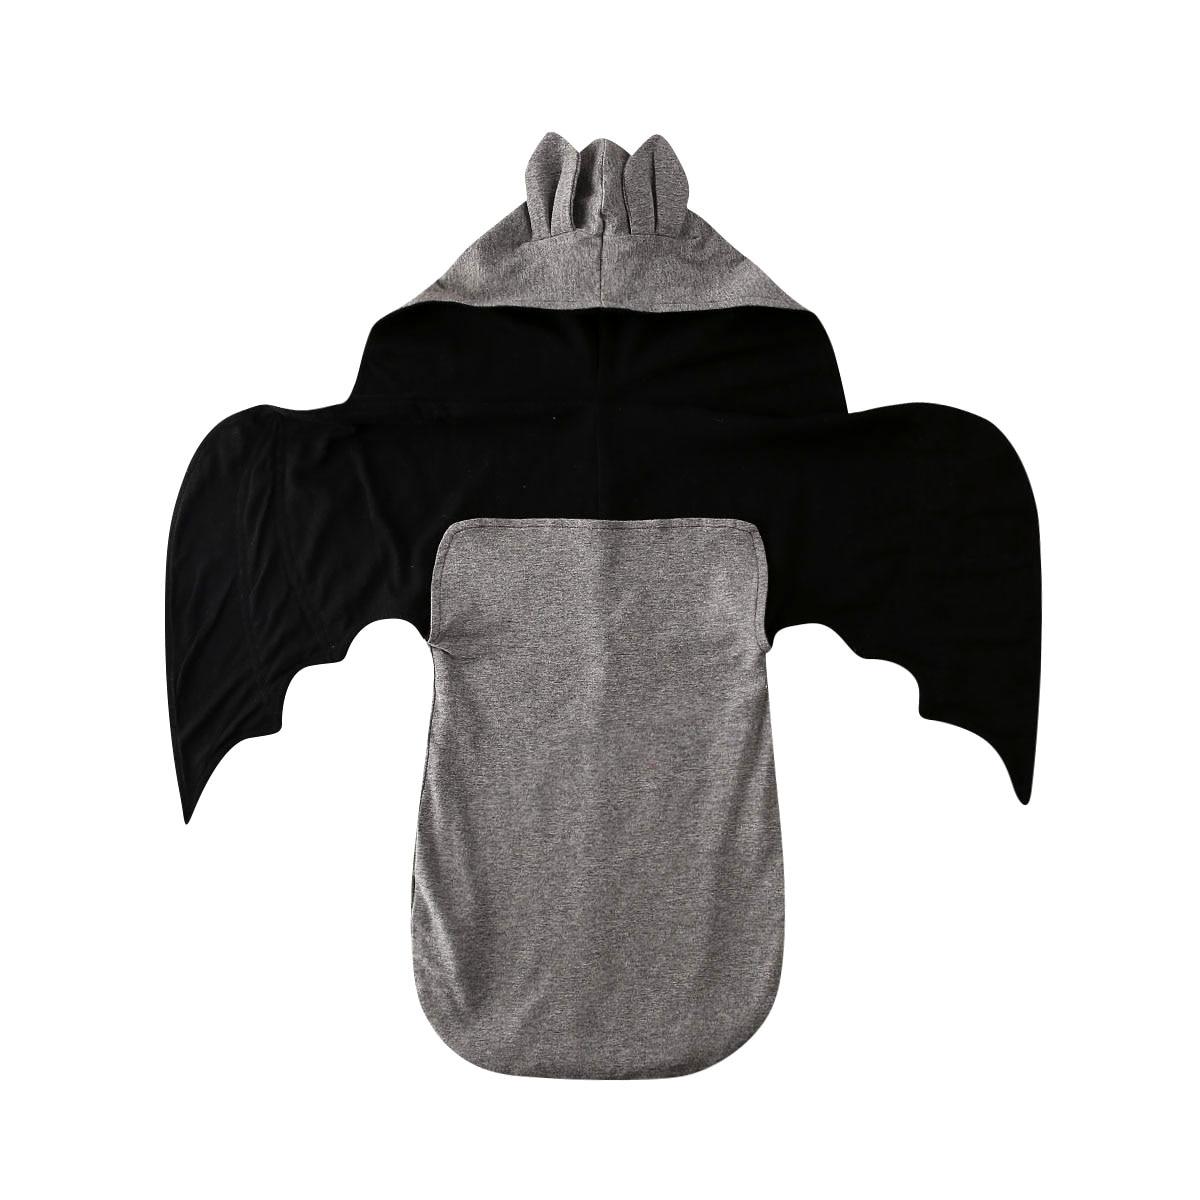 3D Wing Bat Design Sleeping Bags For Newborn Baby Winter Warm Infant Button Swaddle Stroller Wrap Kids Blanket Sleeping Bags